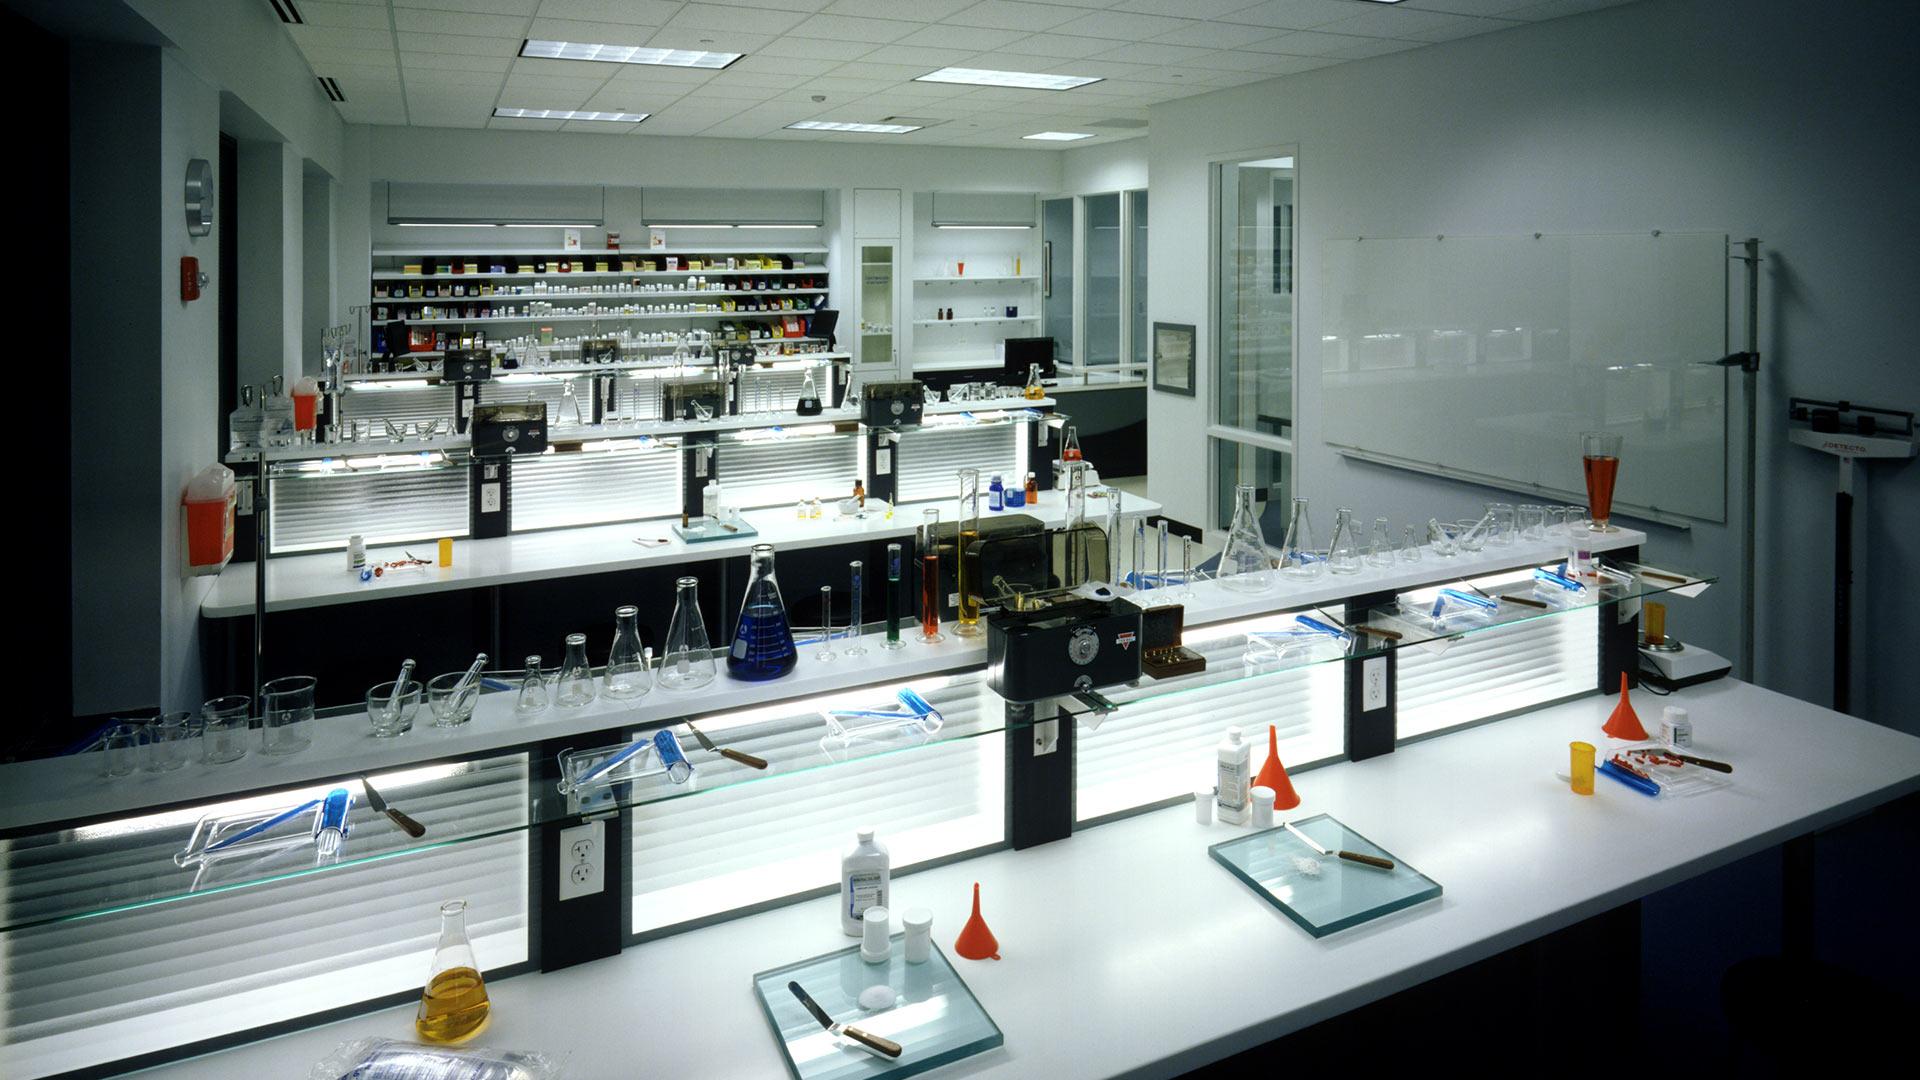 Robert Morris University Medical Training Facility